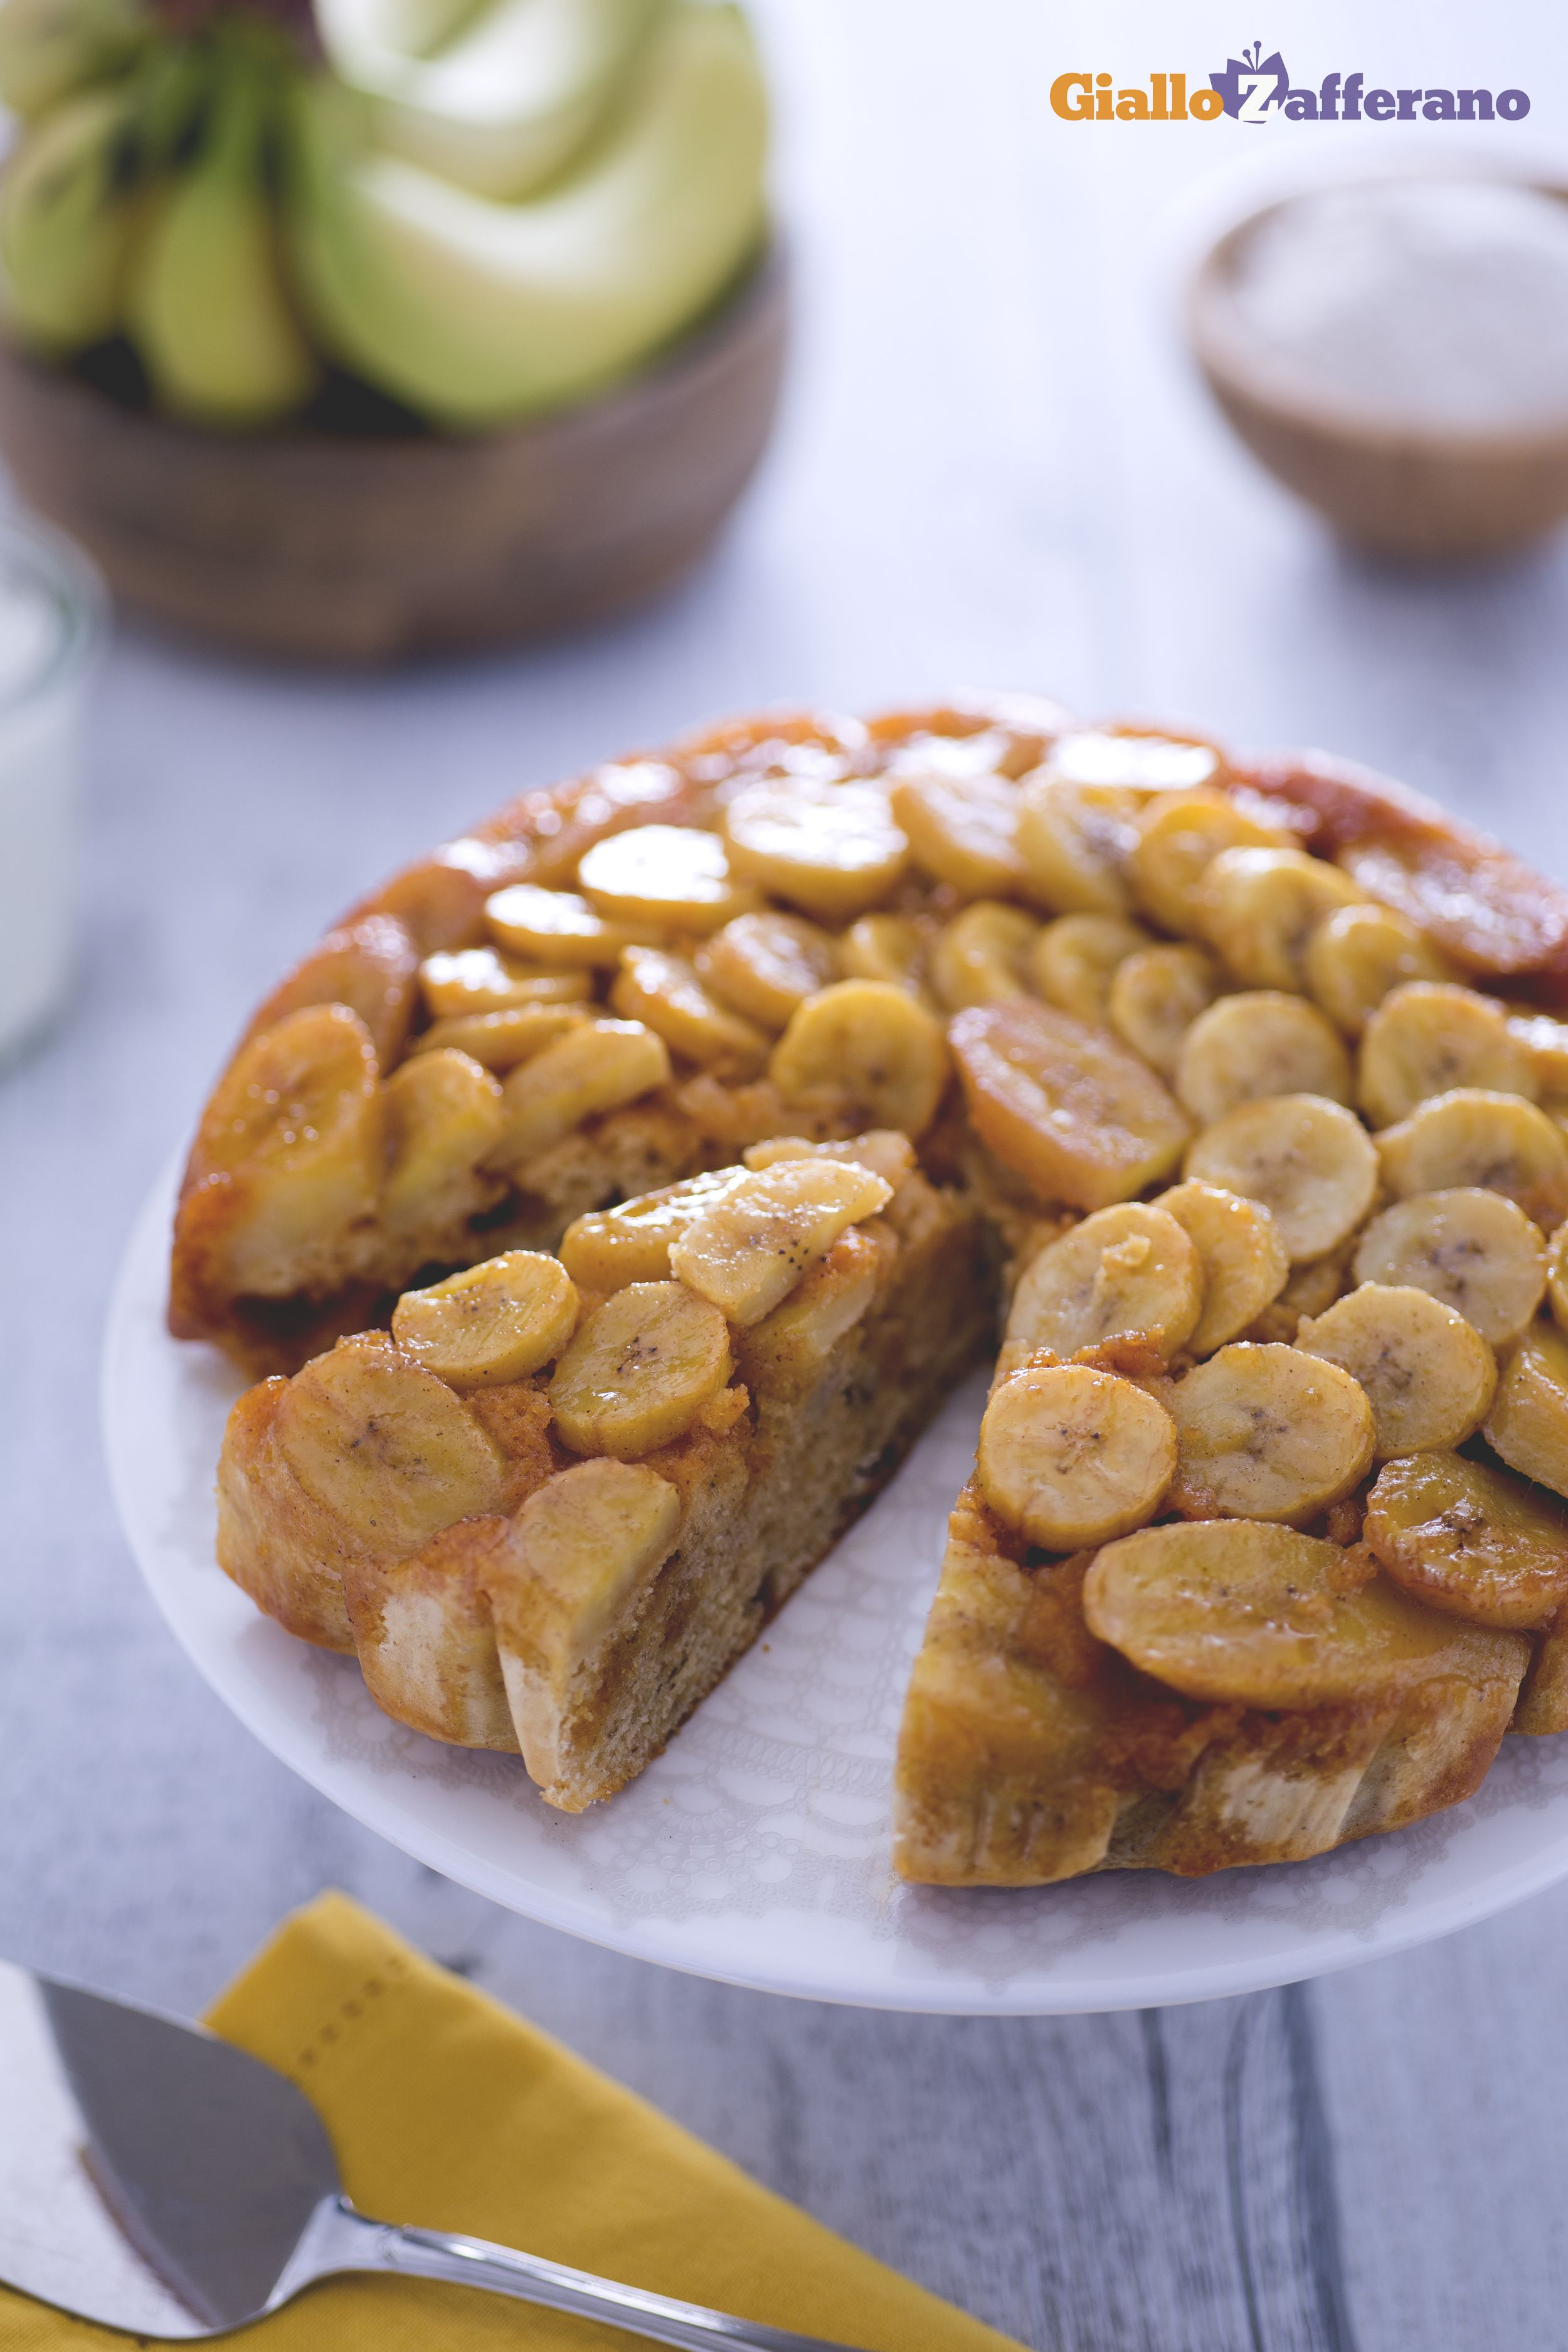 Torta Rovesciata Alle Banane Ricetta Dolce Alle Banane Torte Con Banane Torta Alla Banana